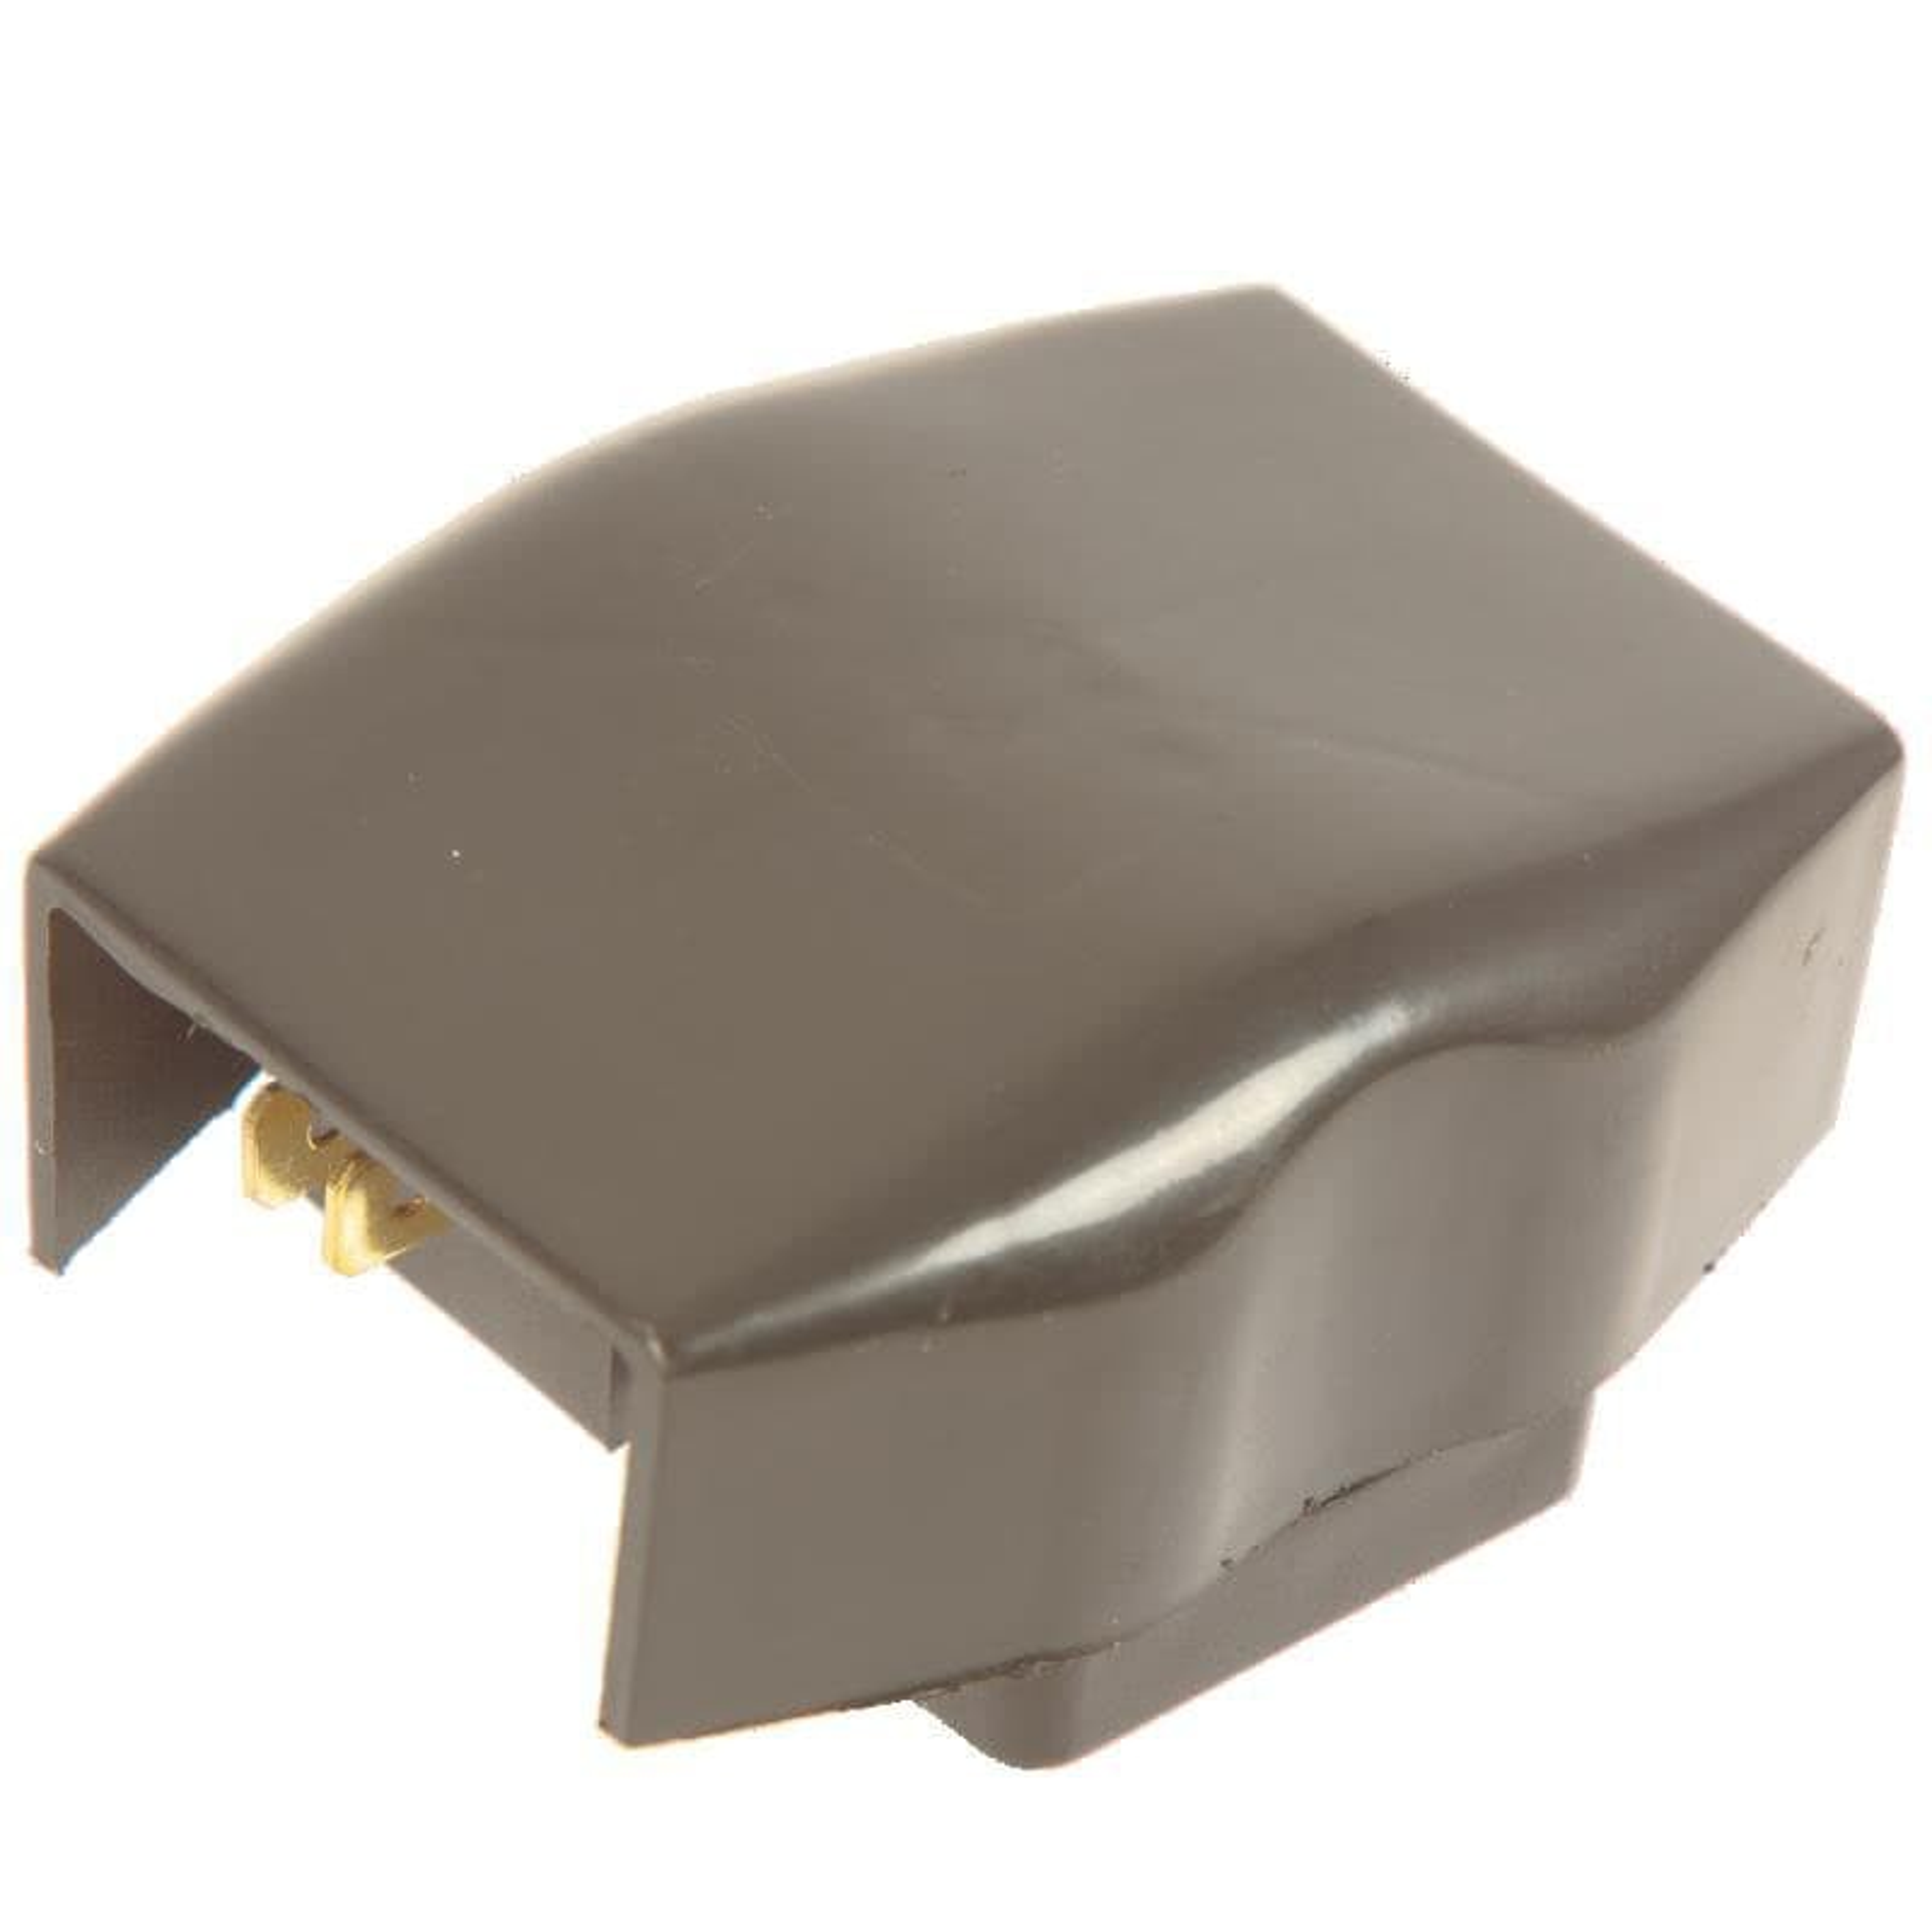 fuse box, lucar terminals  view larger